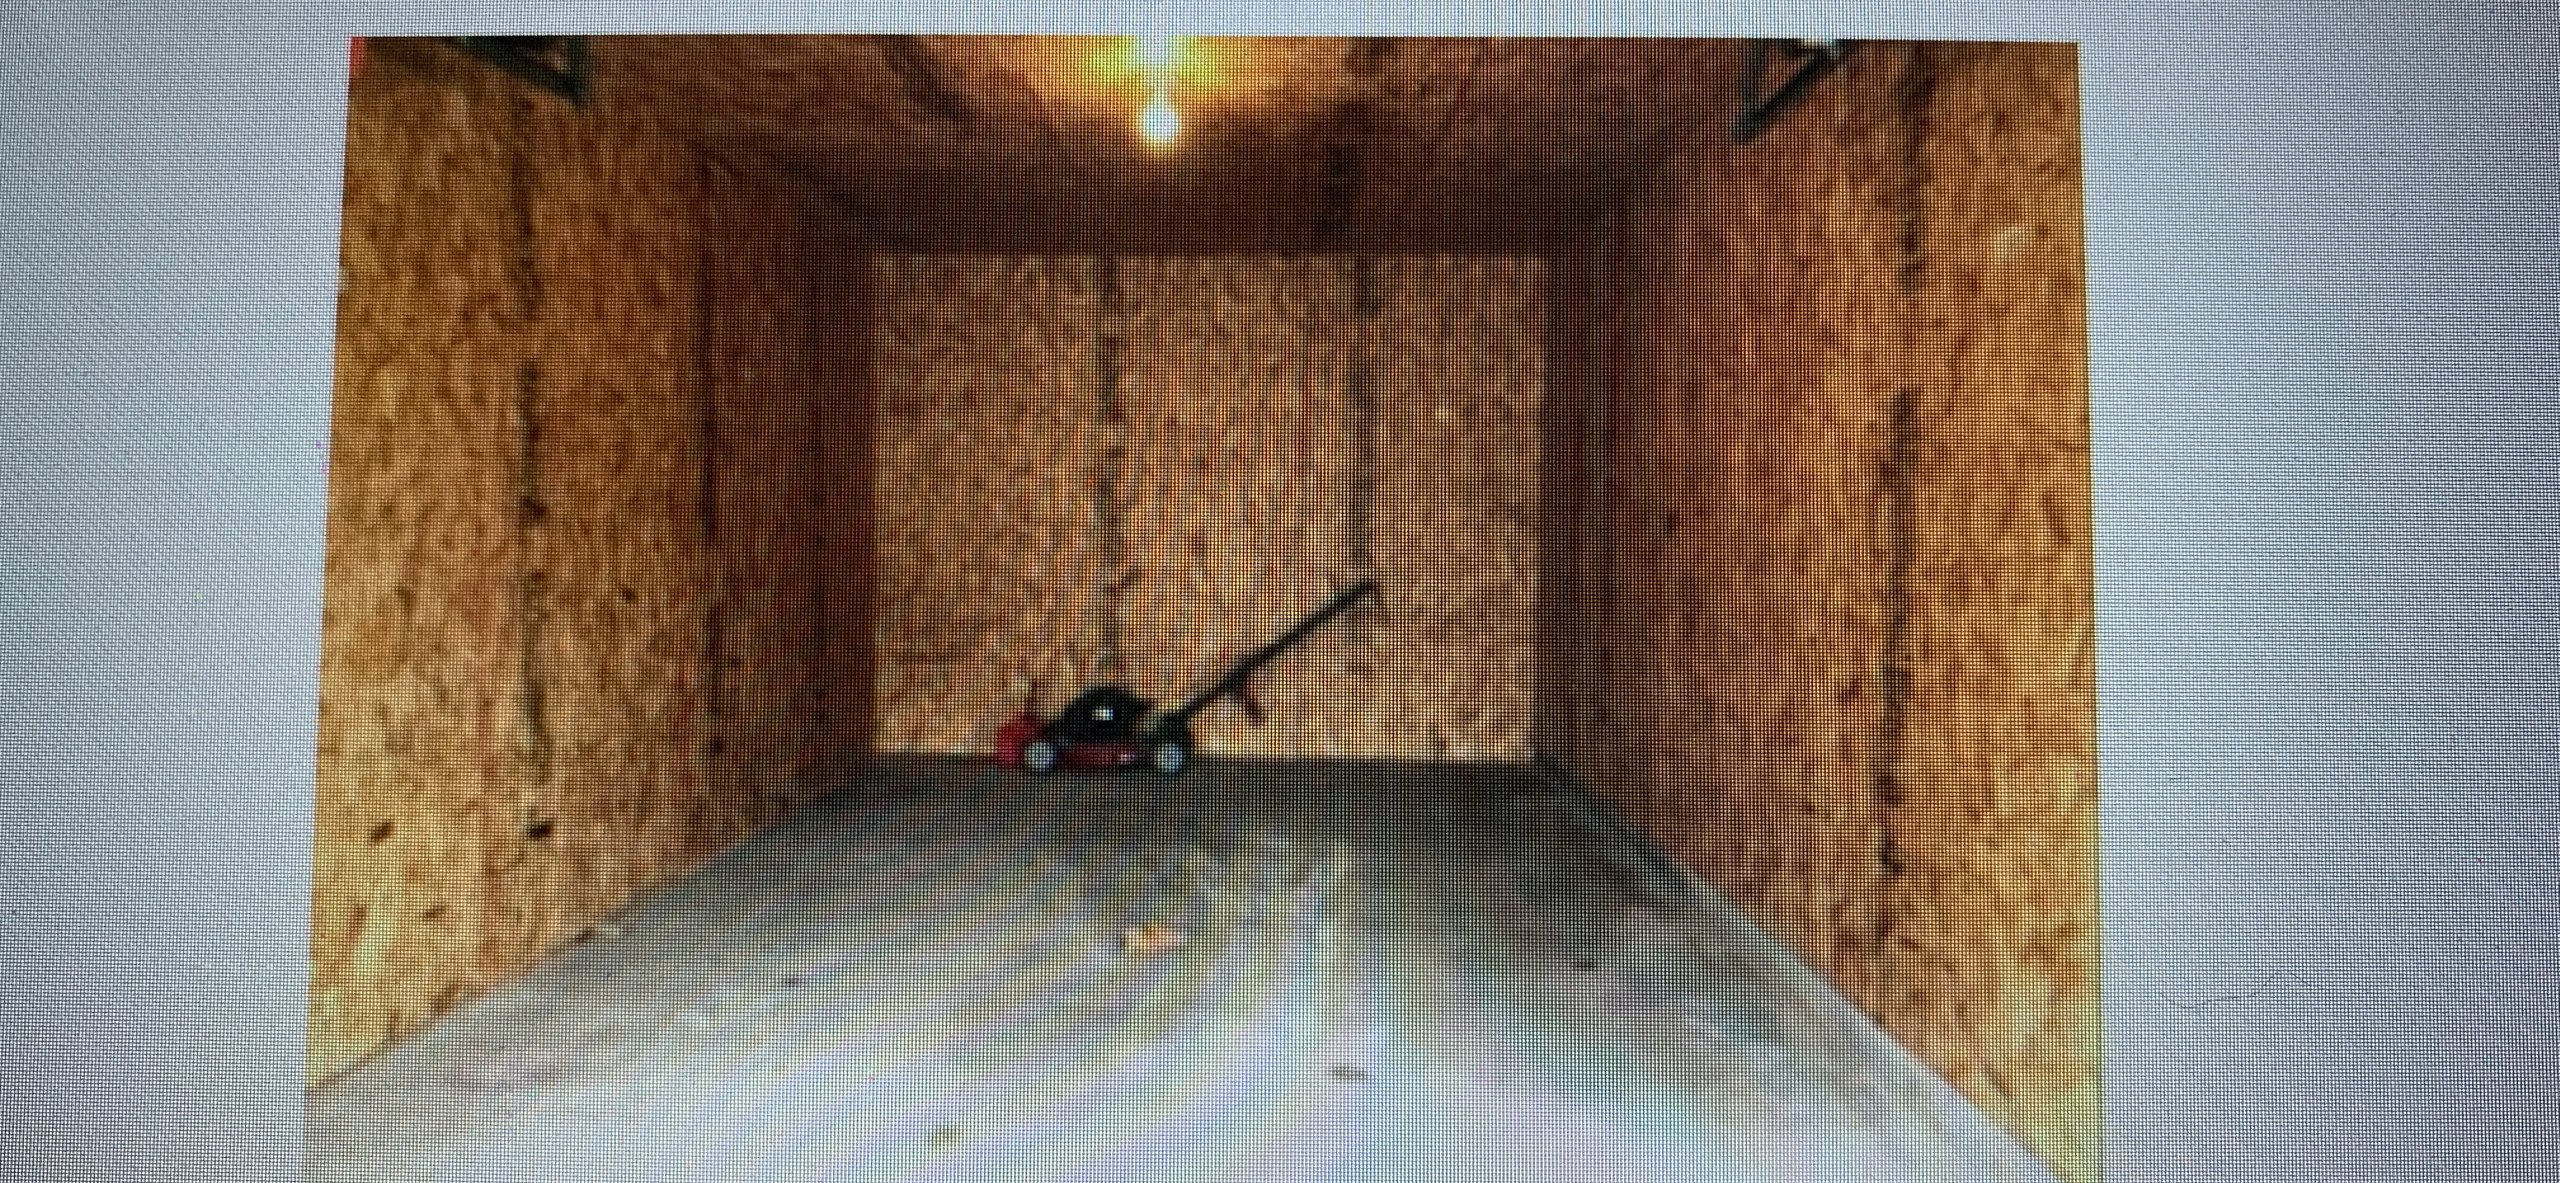 21x7 Self Storage Unit self storage unit